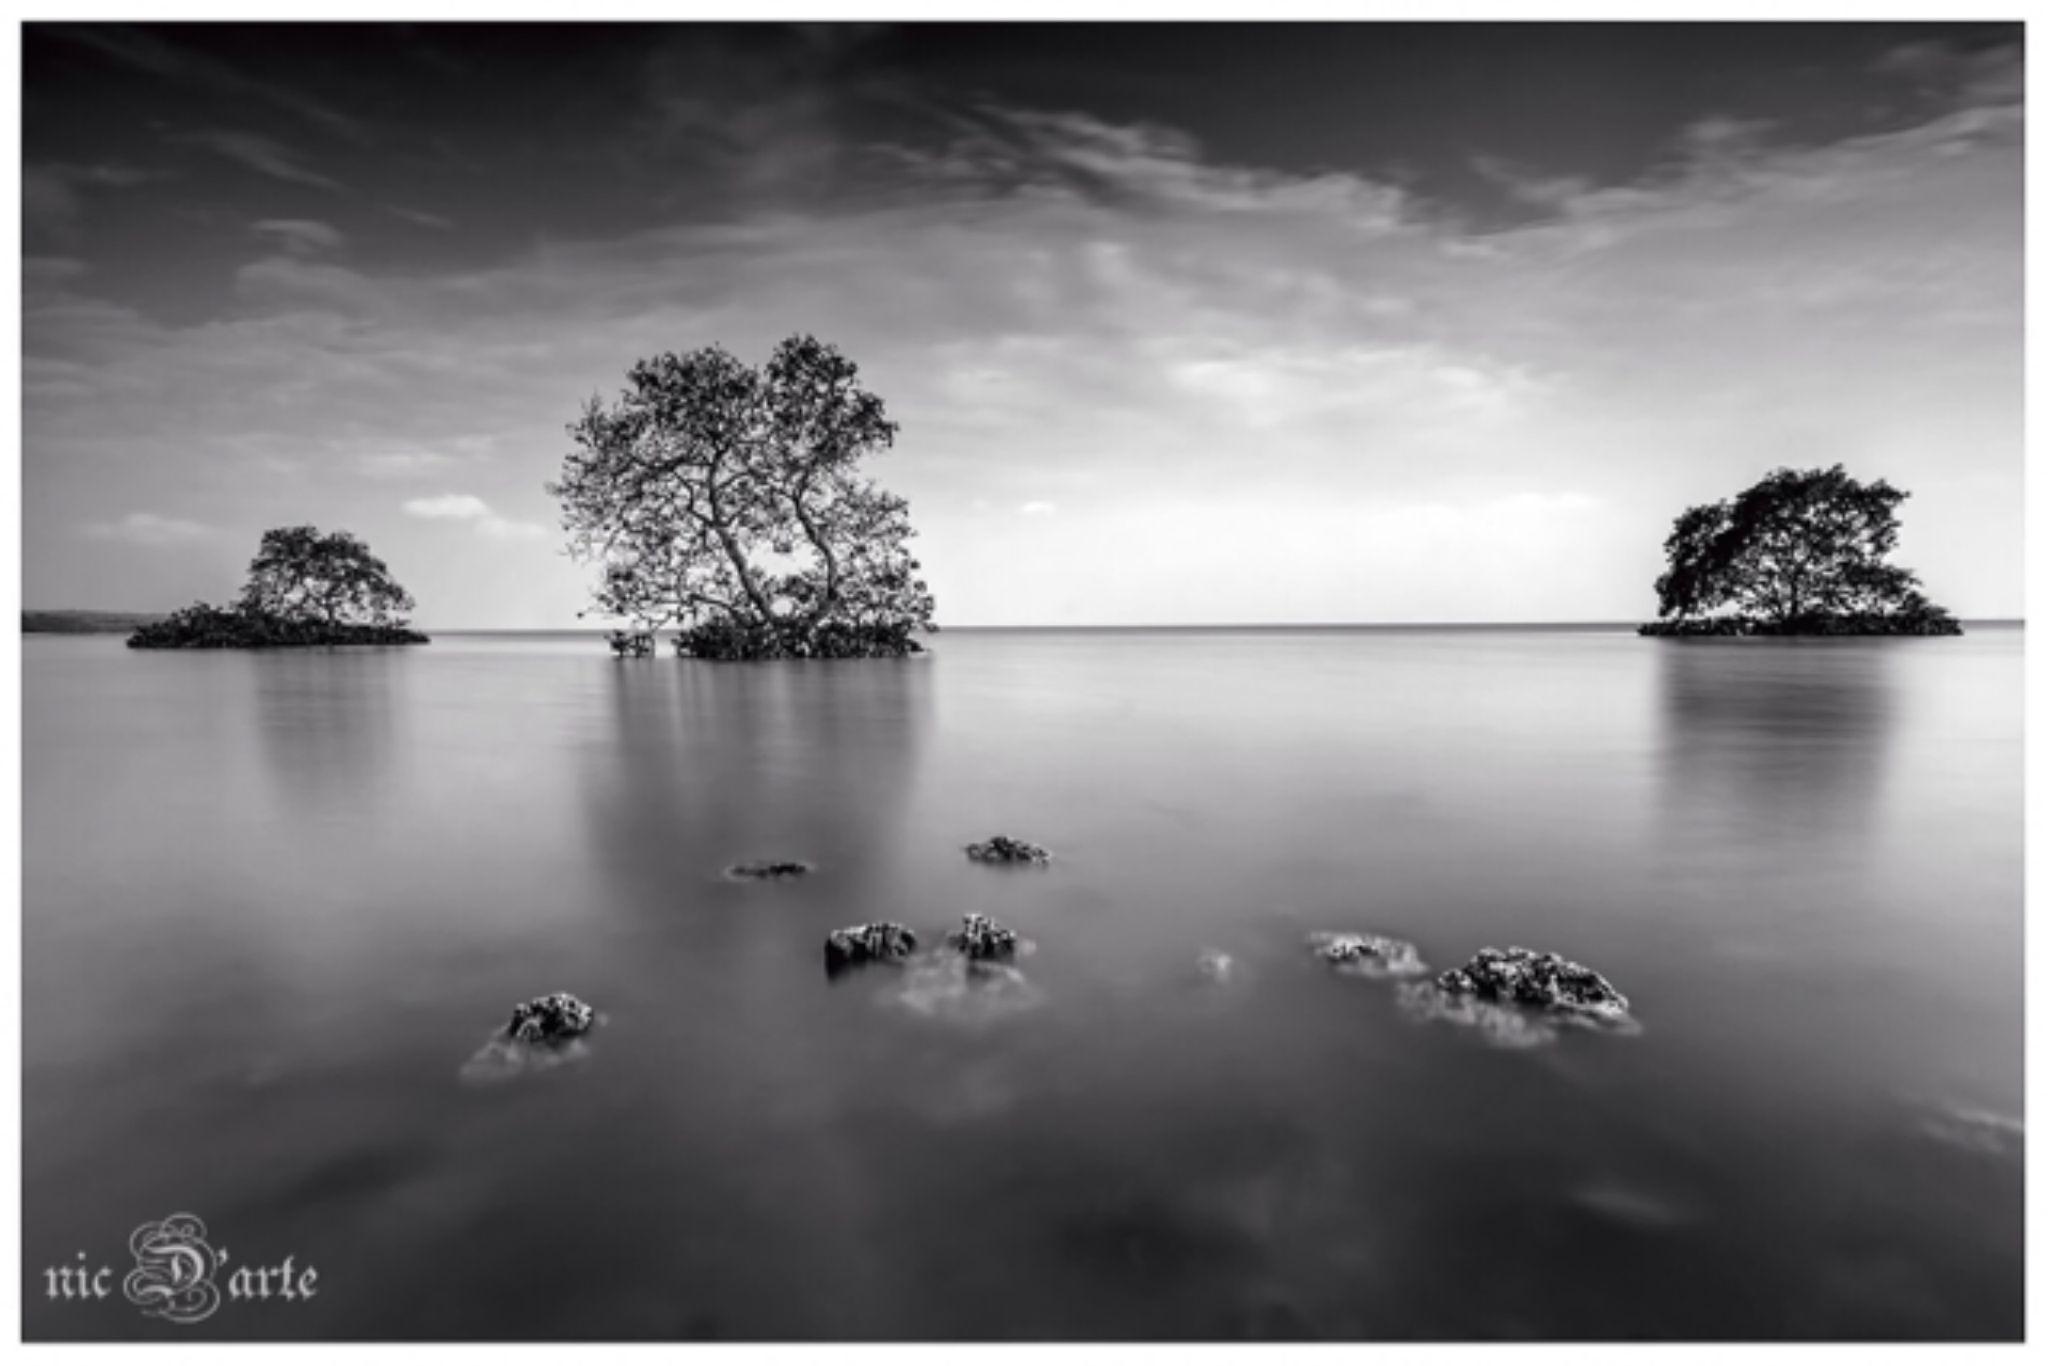 IMG_0055 by Nic D'arte